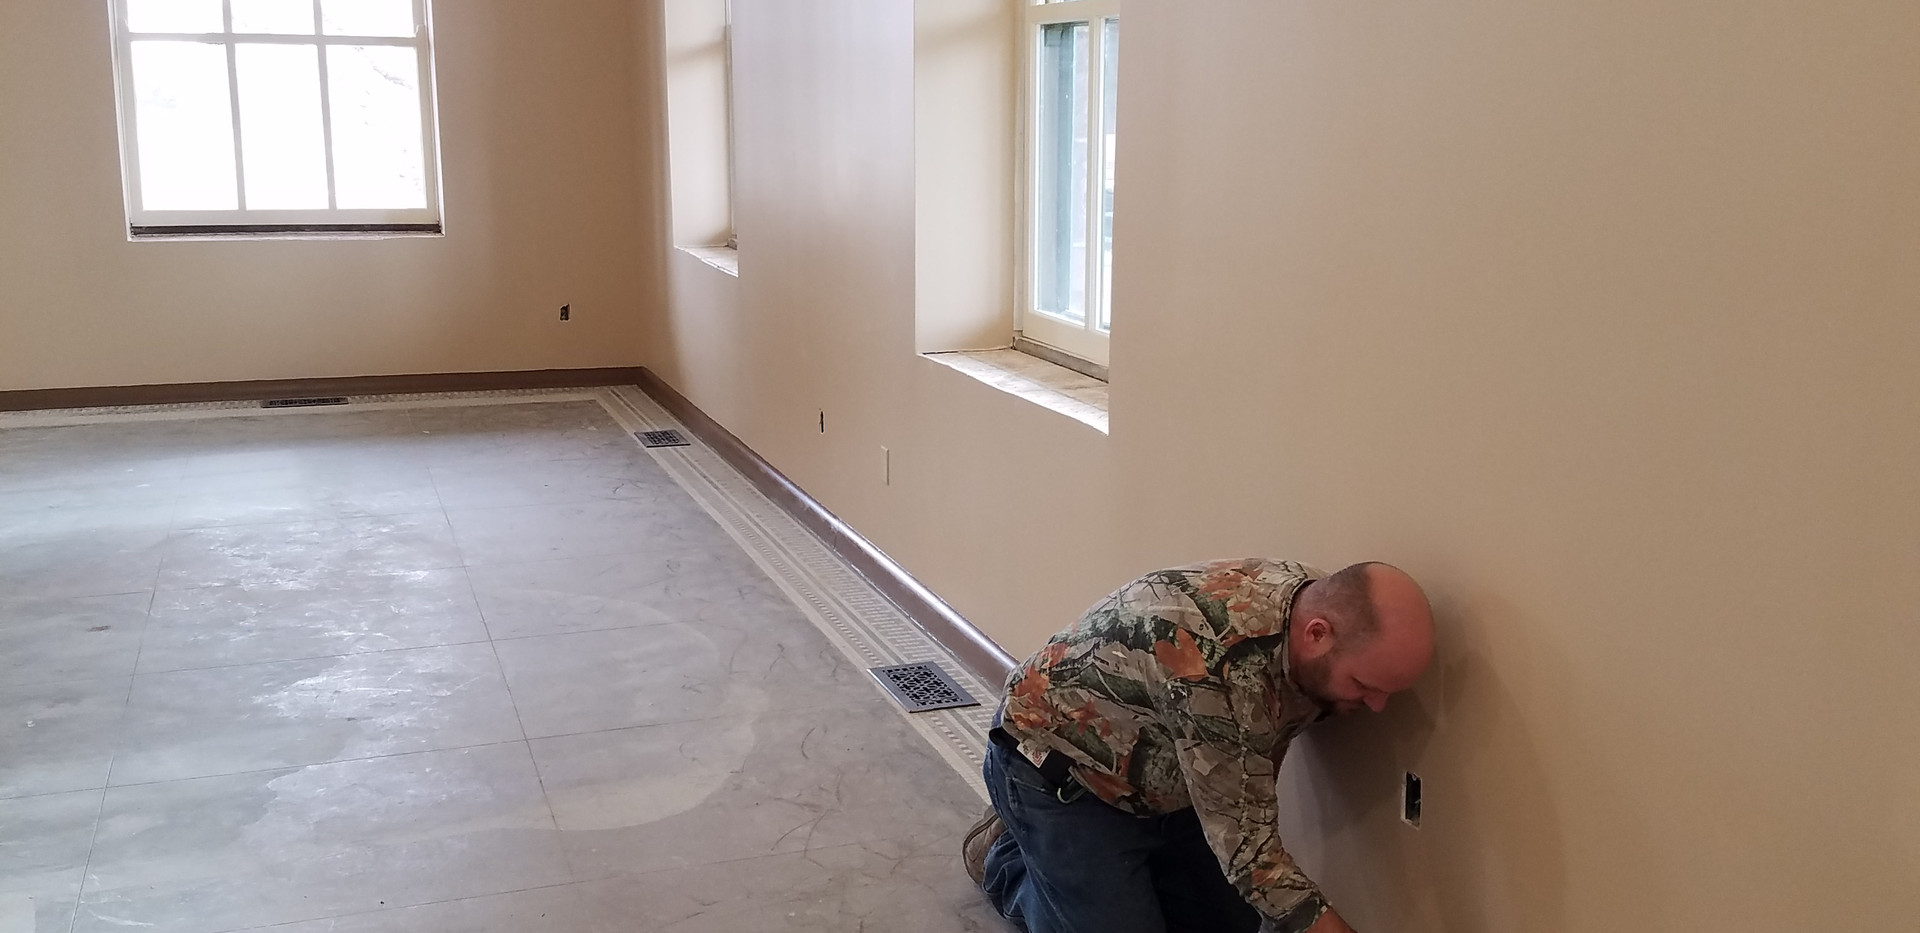 Joe painting baseboard 01122018.jpg